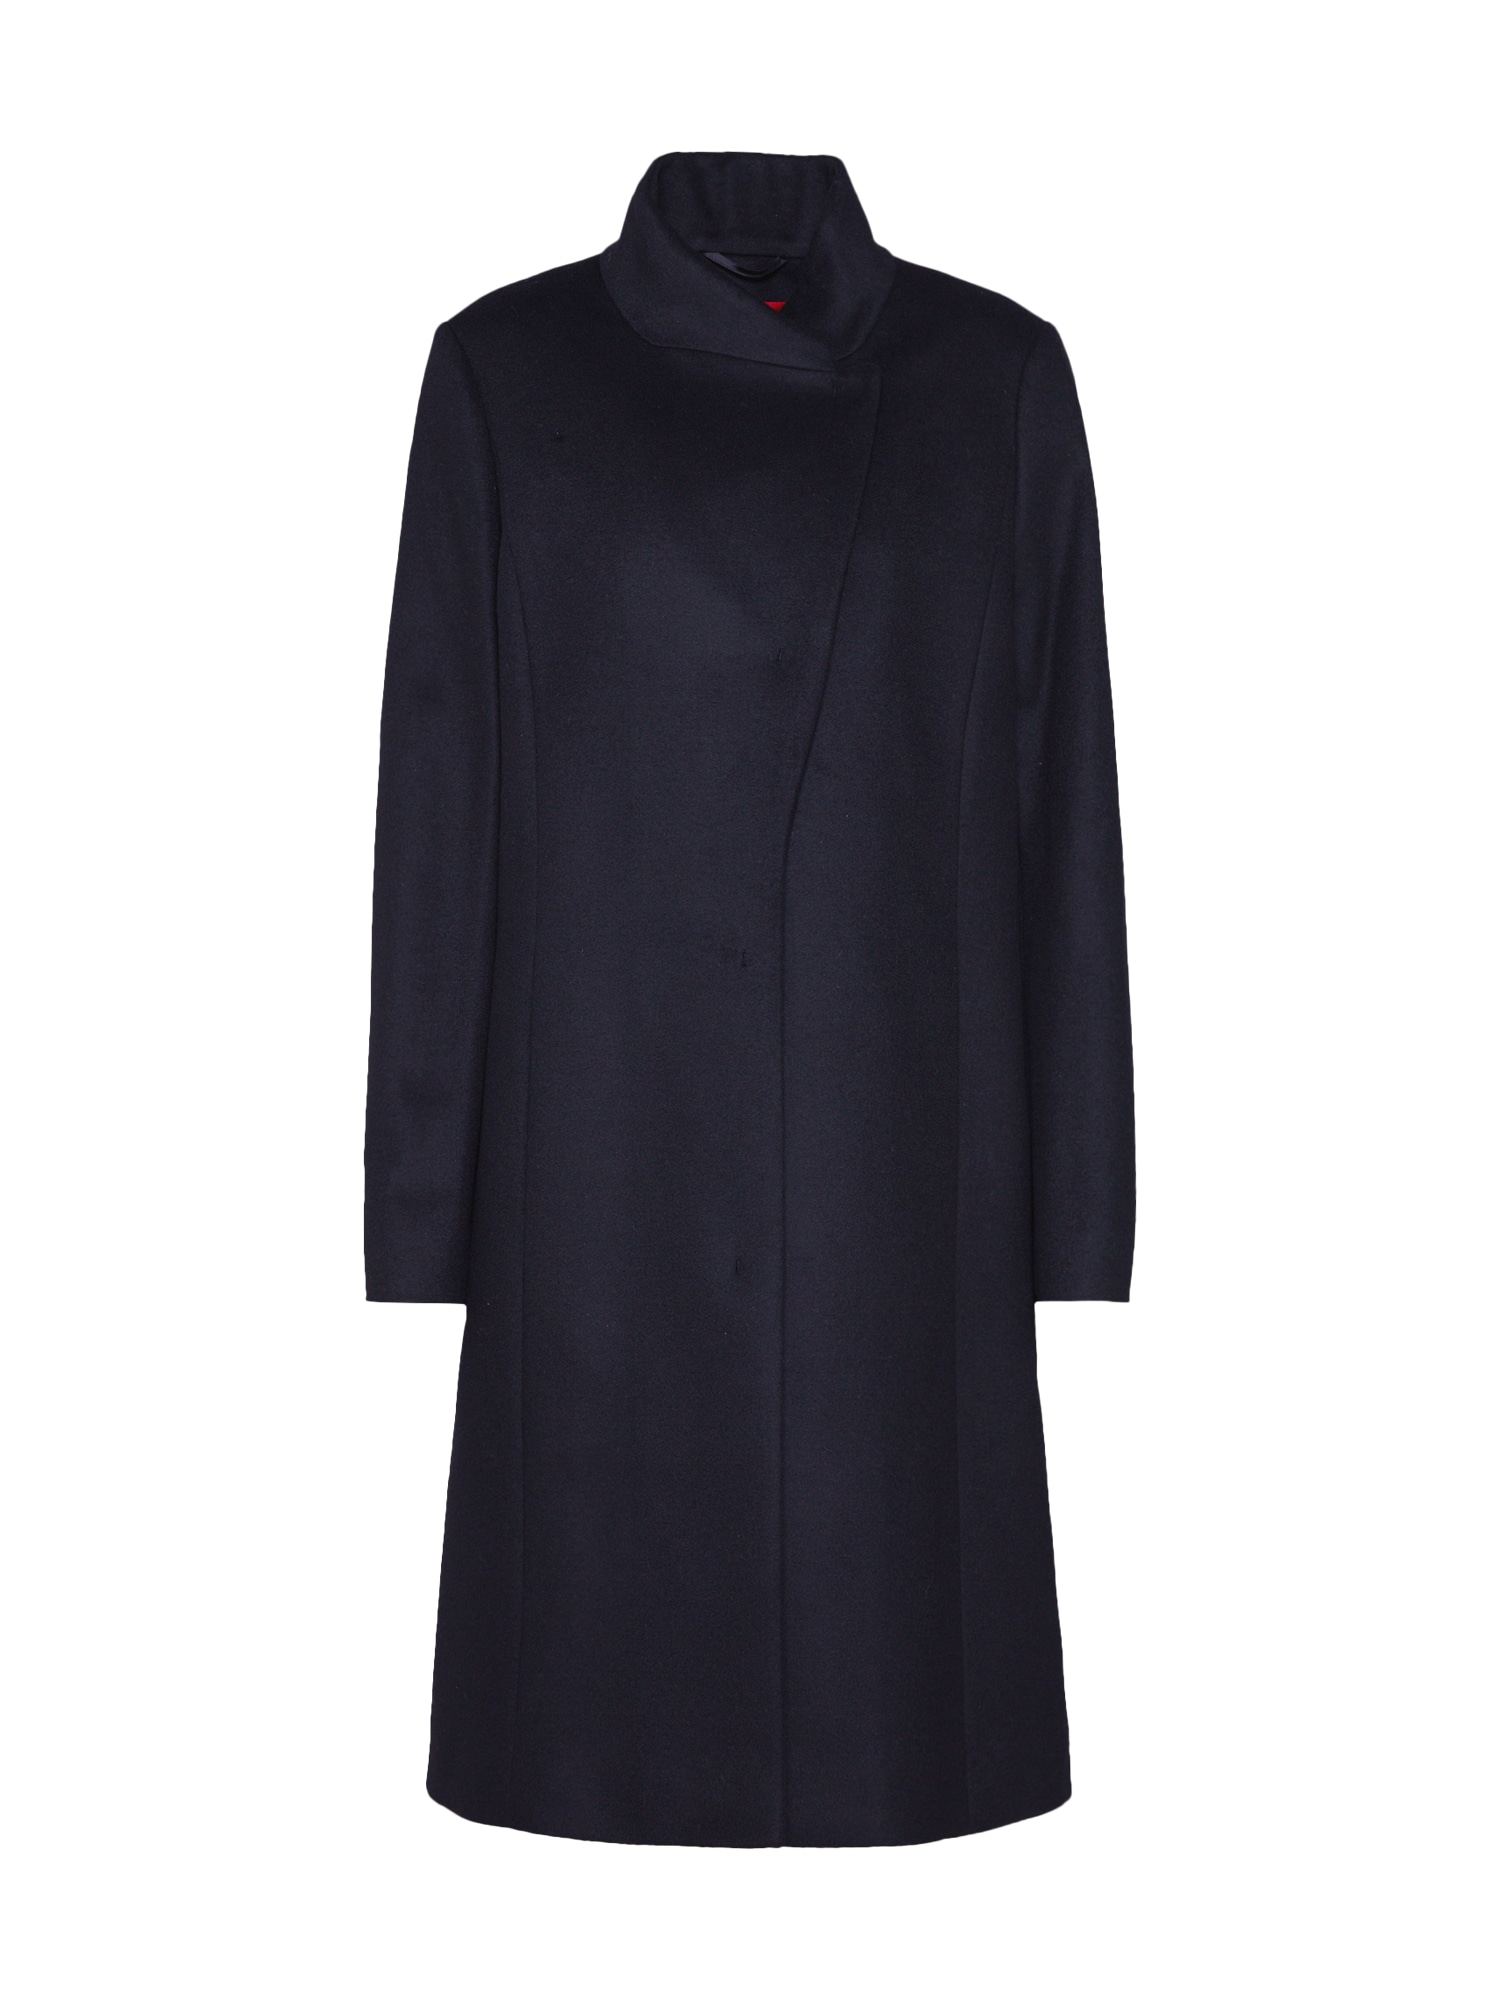 Přechodný kabát Metura černá HUGO